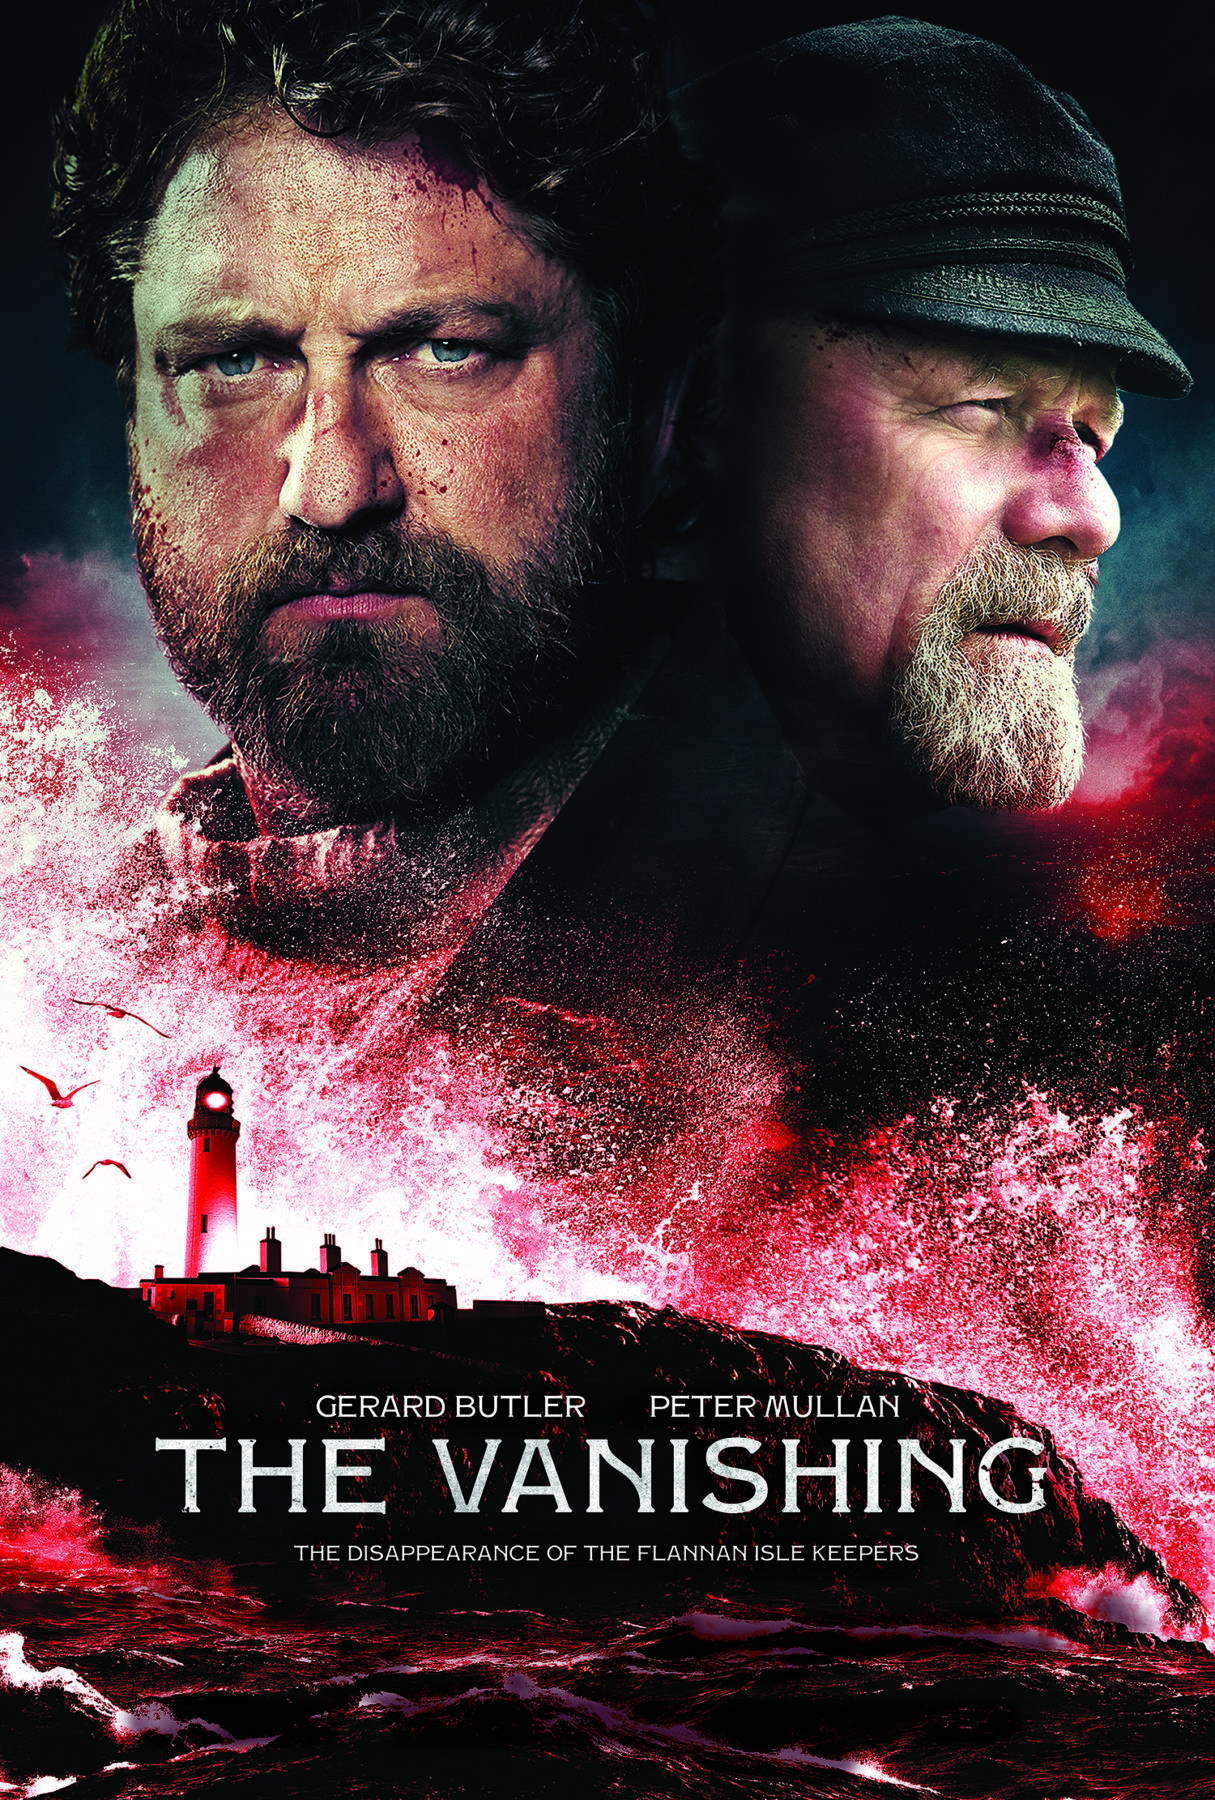 New Poster for Thriller 'The Vanishing' Based on the